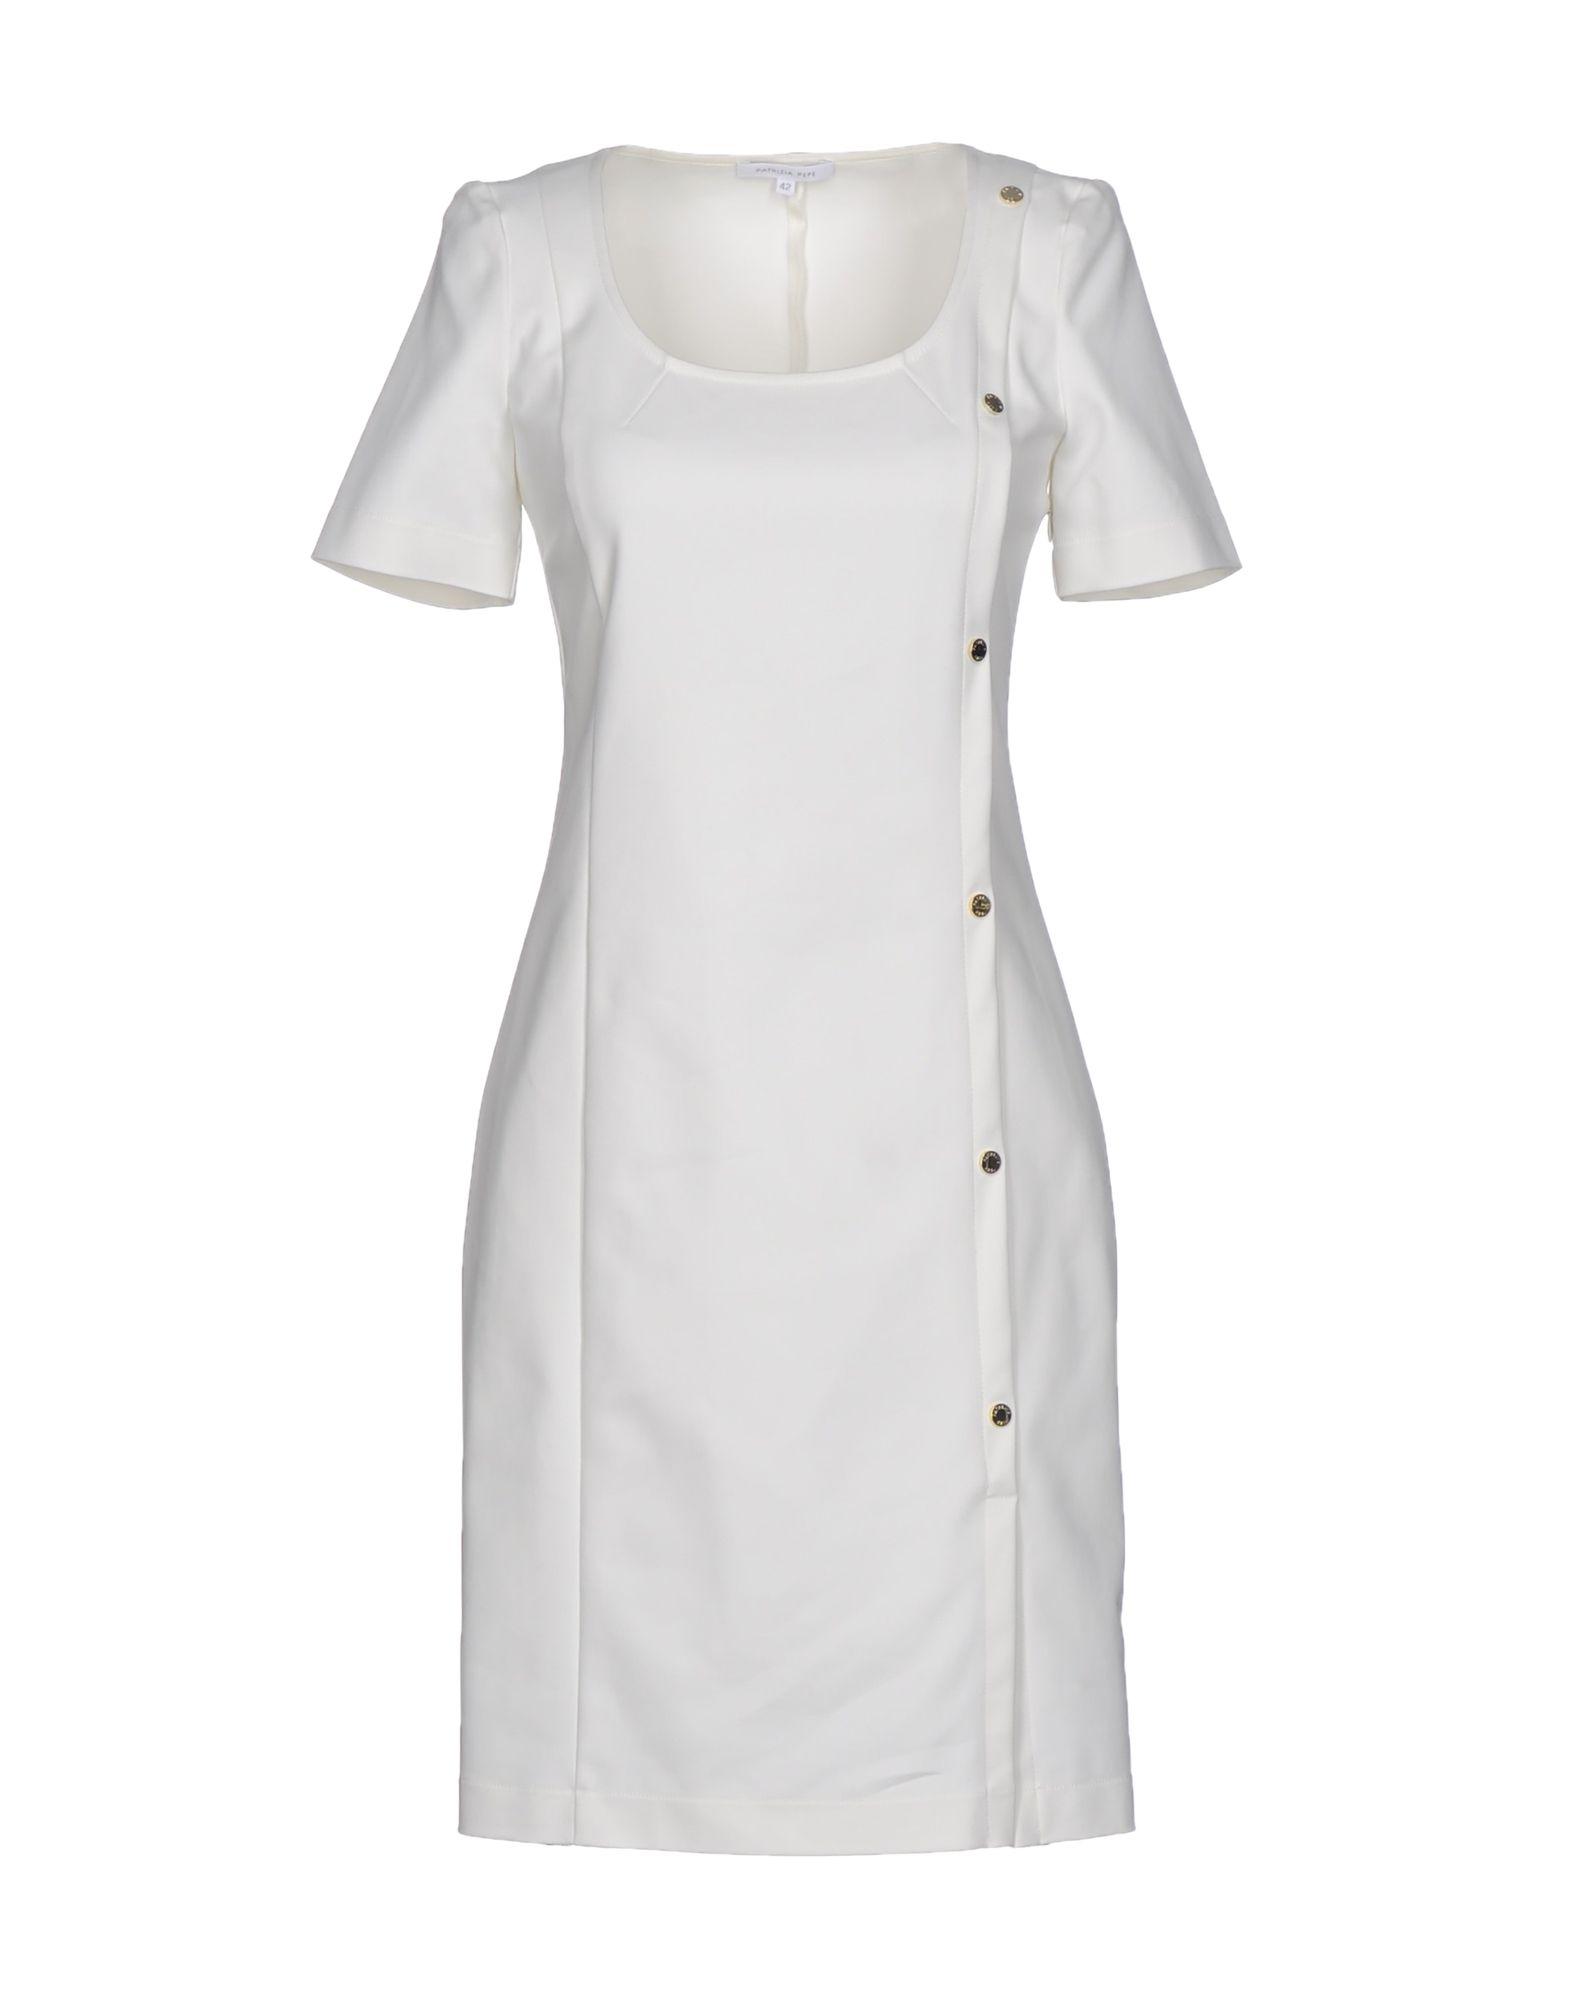 PATRIZIA PEPE | PATRIZIA PEPE Short dresses | Goxip